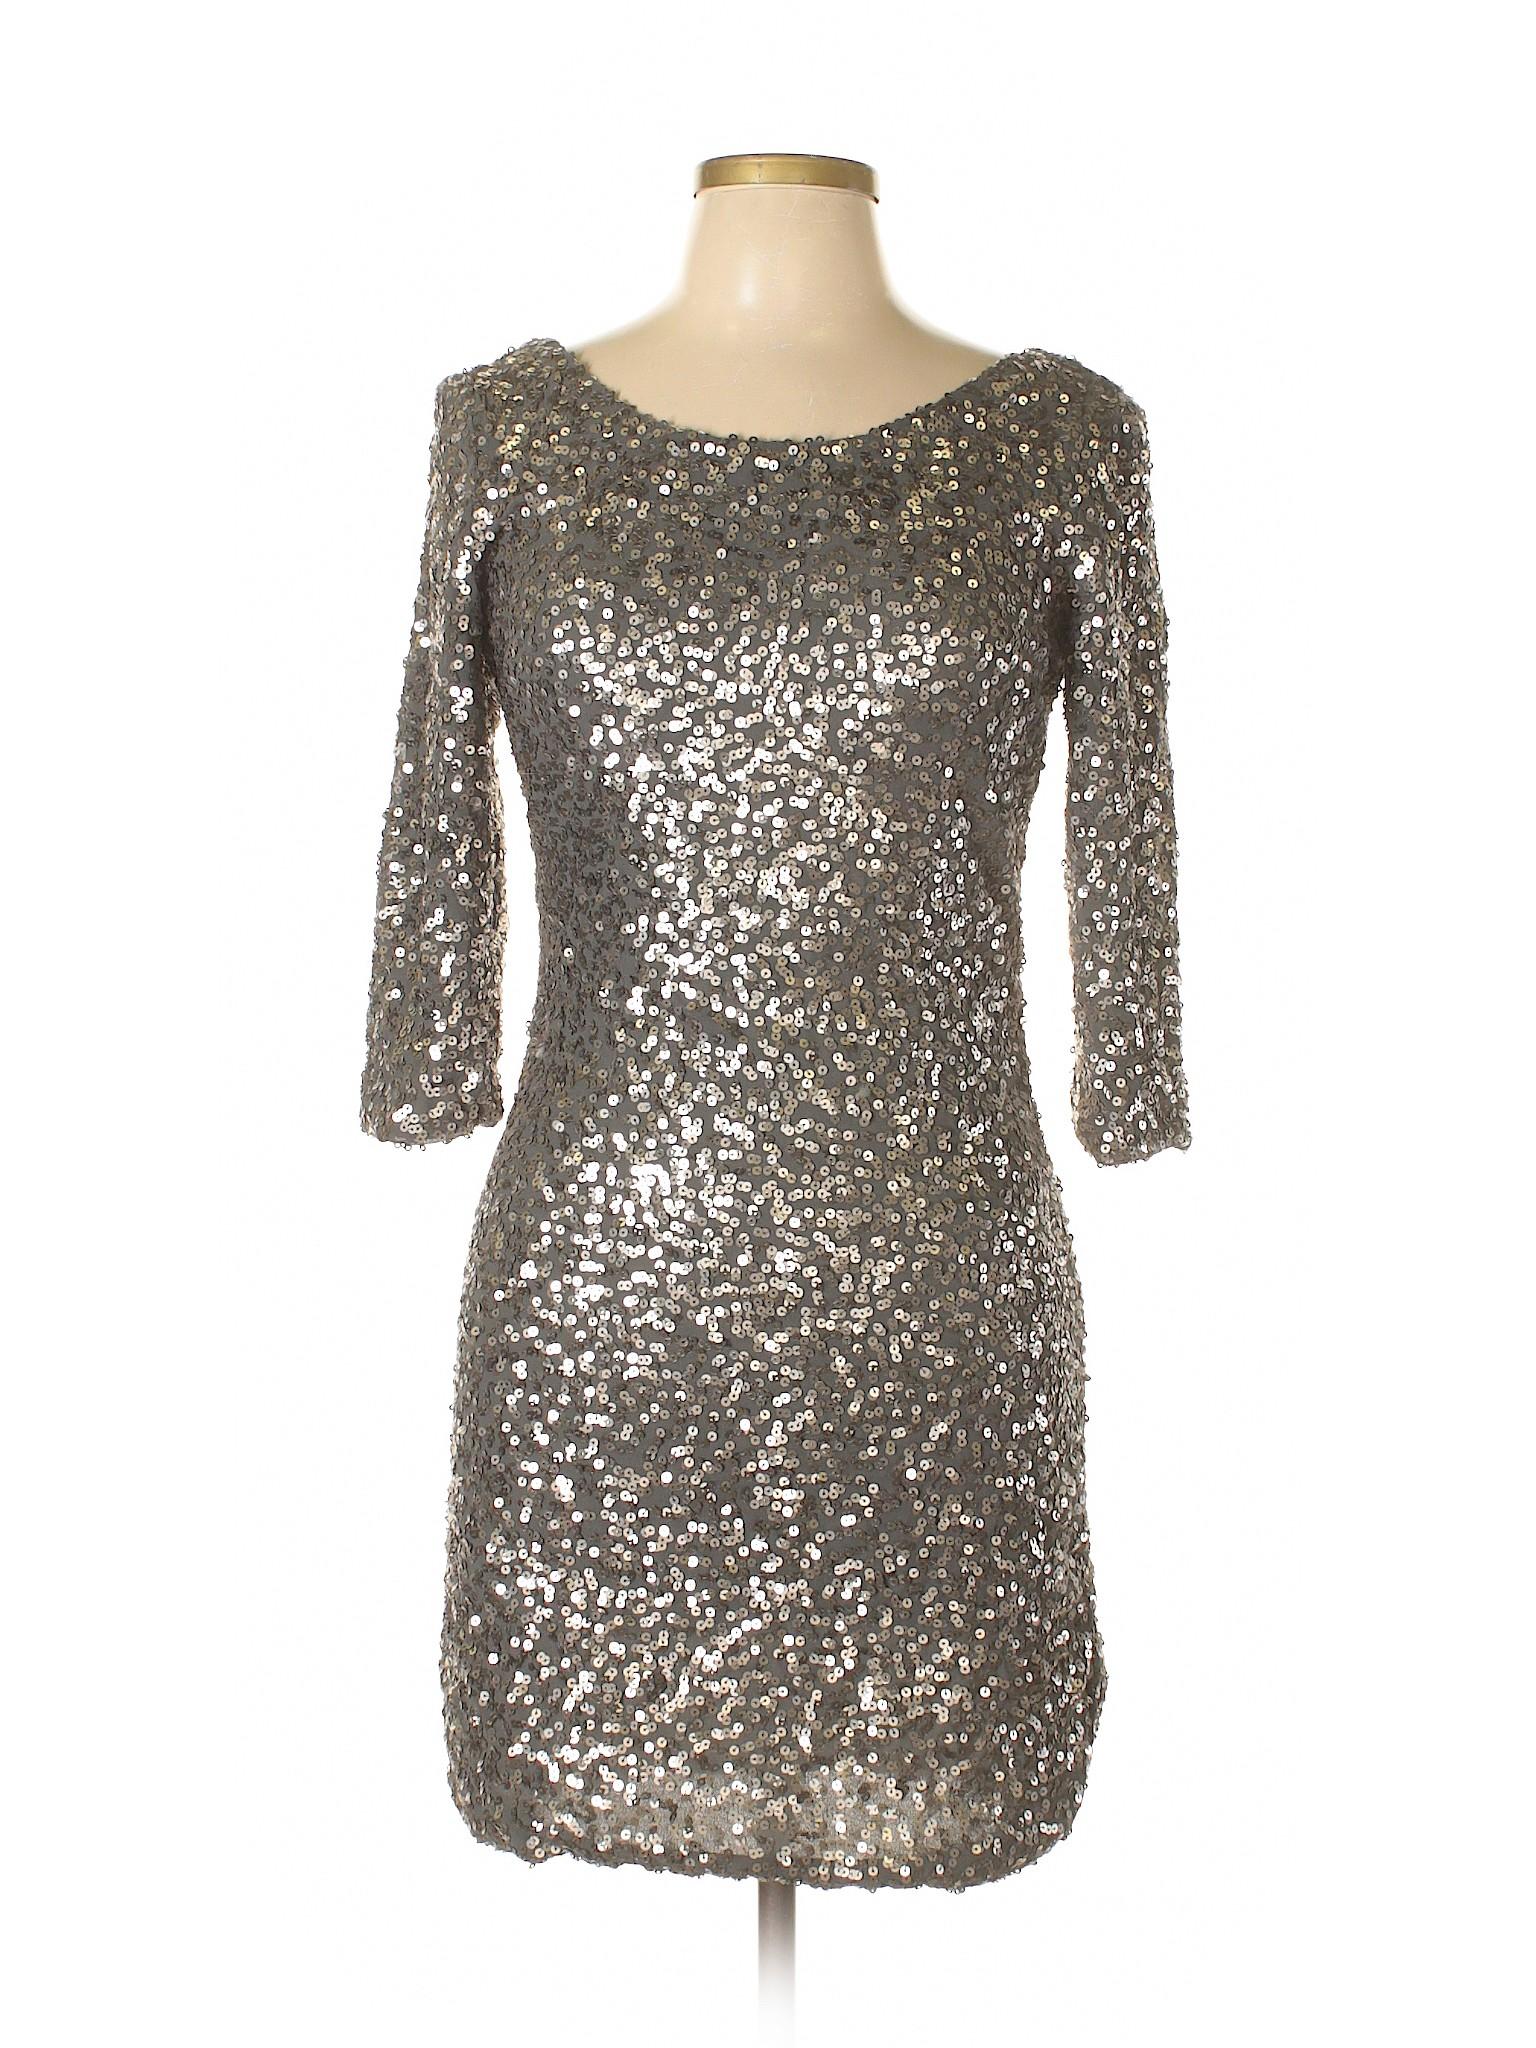 Conrad Selling Dress Cocktail Selling Lauren Lauren tRq77w